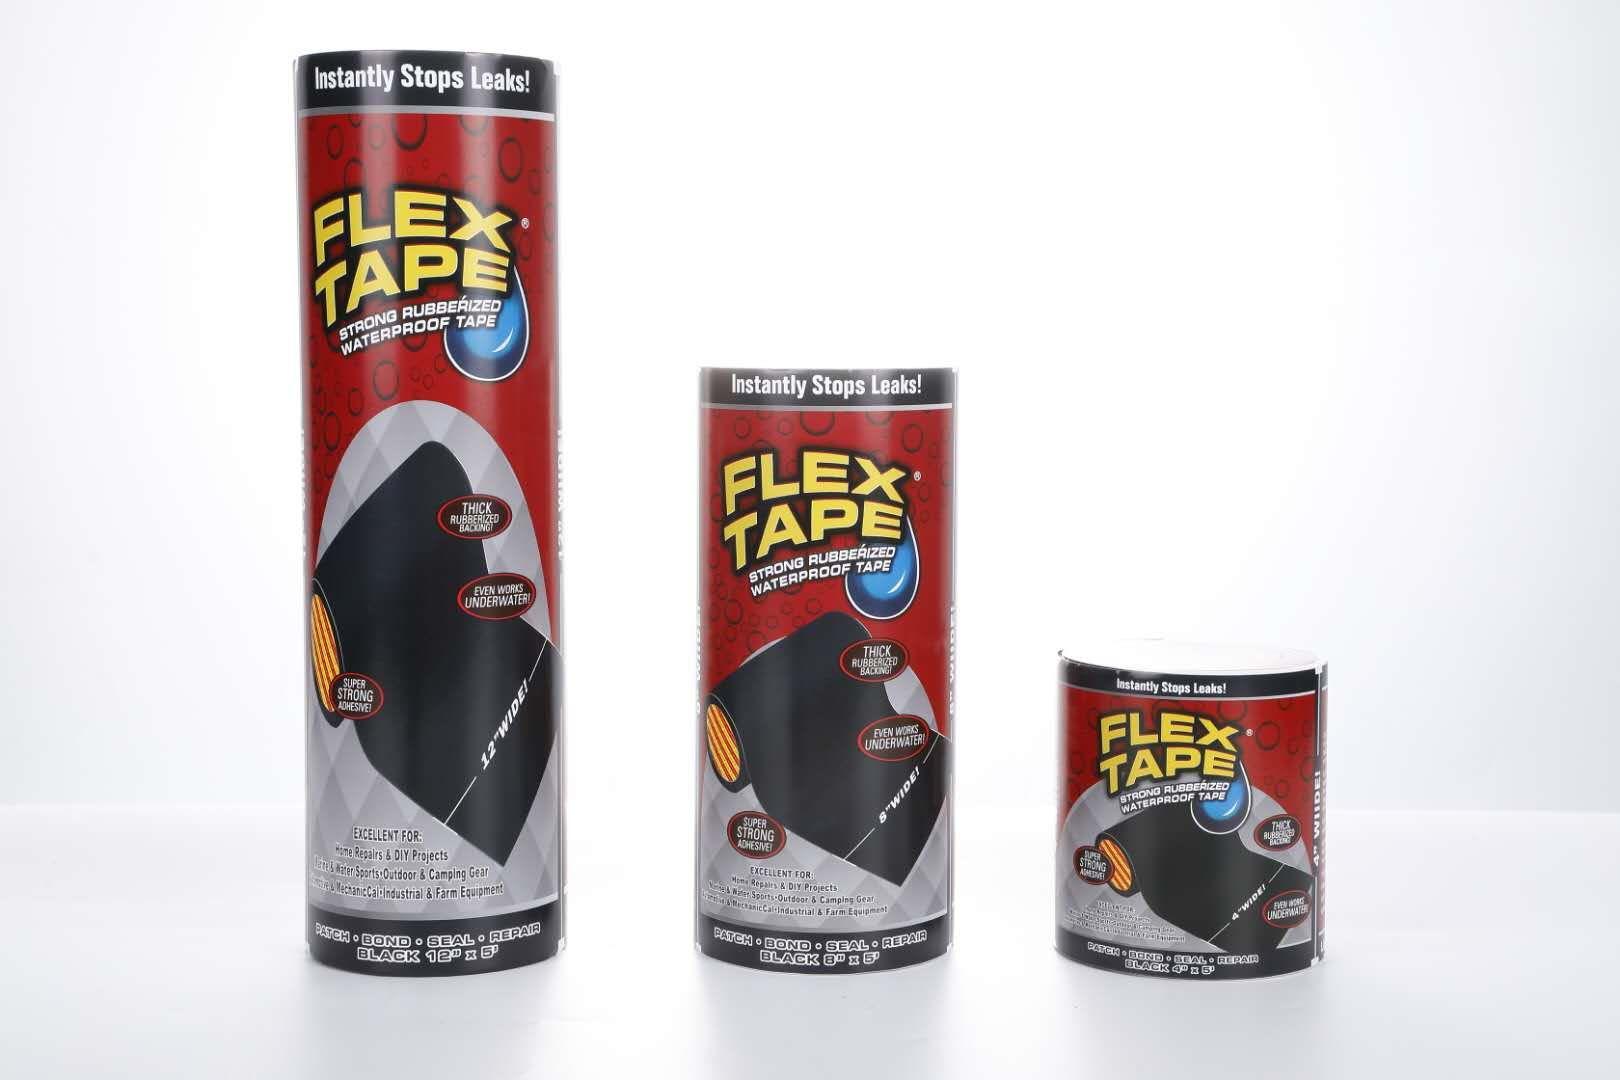 FLEX TAPE 防水胶带 管道修补胶带 超粘FLEX TAPE胶带 防水补漏胶带